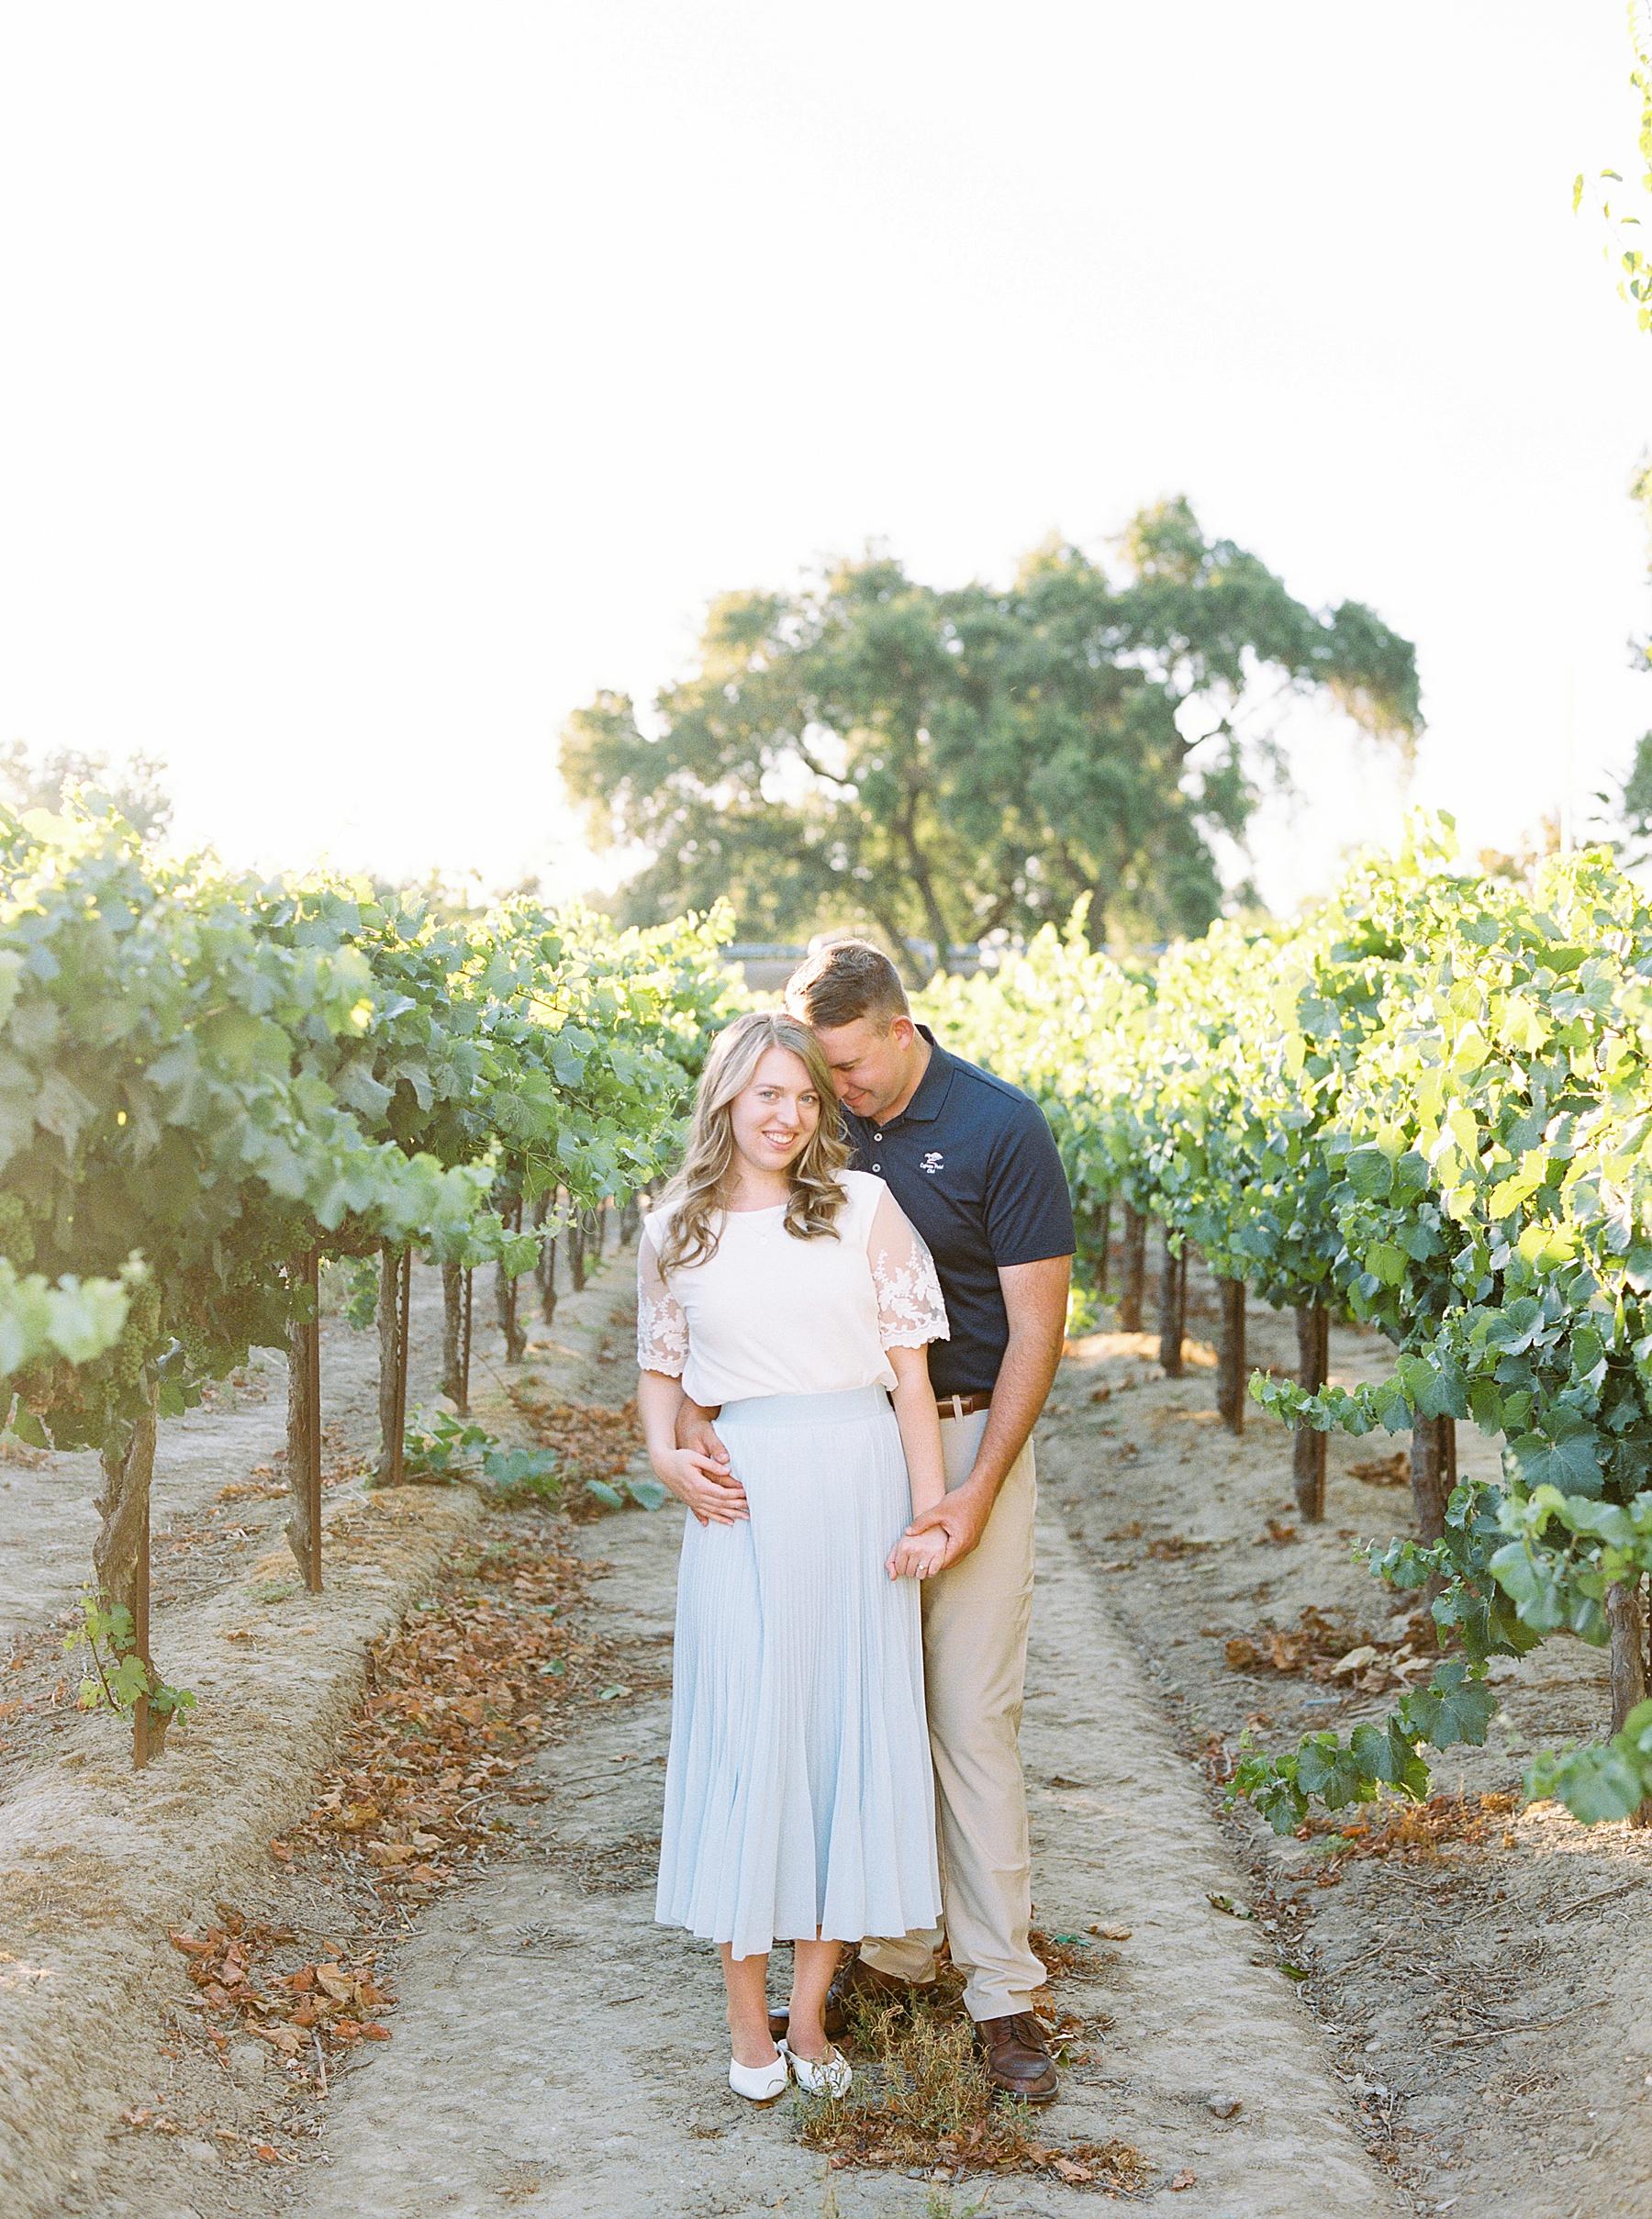 Scribner Bend Winery Engagement Session - Courtney and Steven - Ashley Baumgartner - Sribner Bend Wedding Photographer - Sacramento Wedding Photographer_0019.jpg